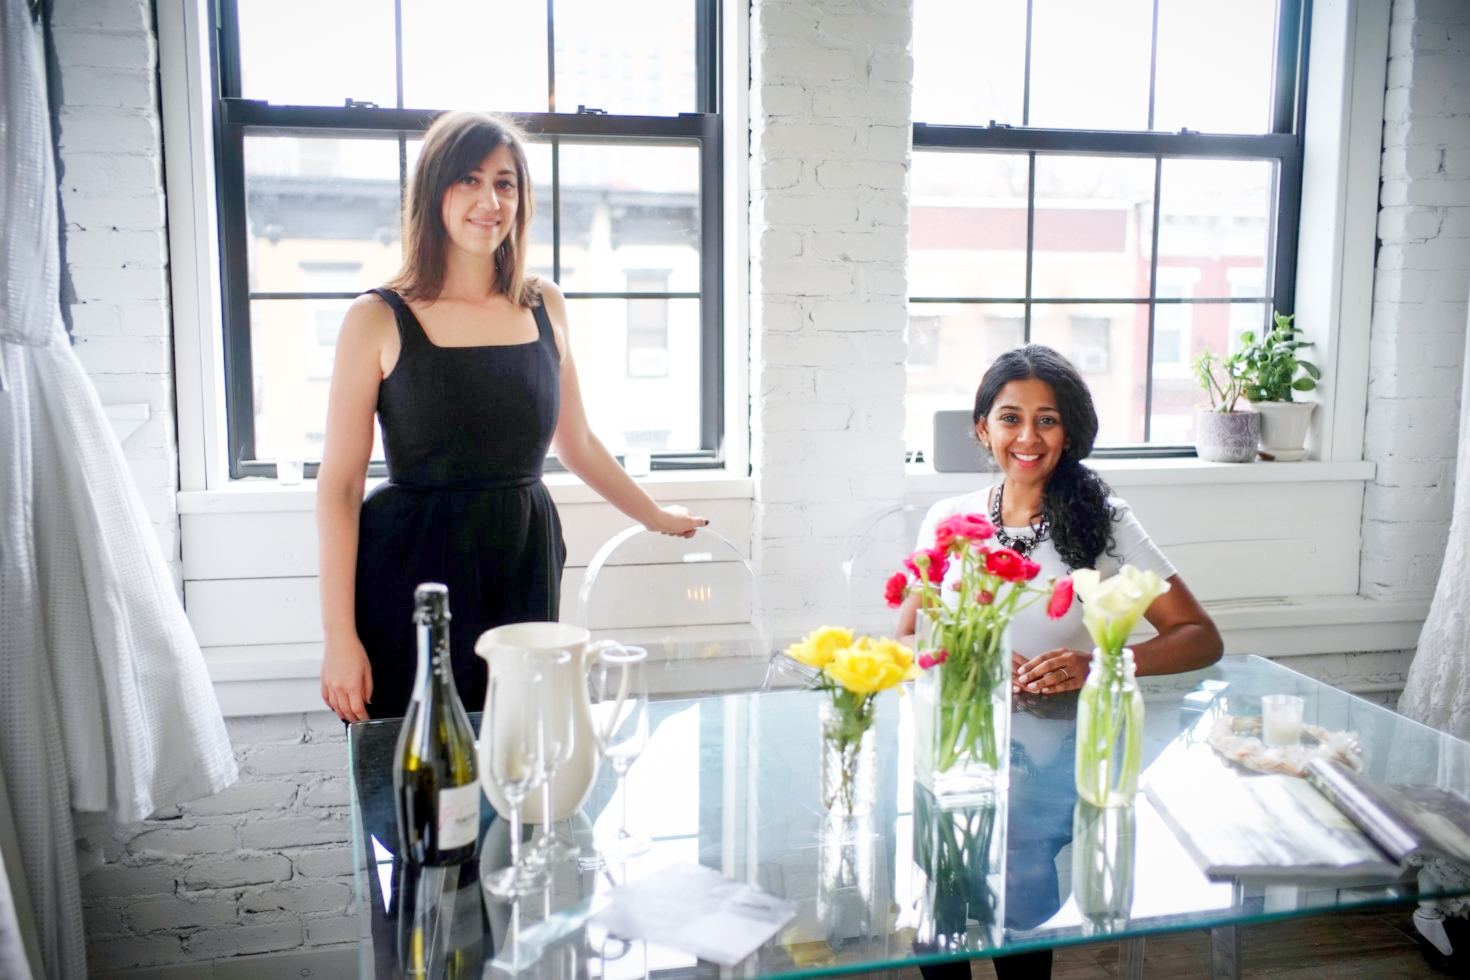 Sathya Balakumar and Heather Green at Lakum Boutique